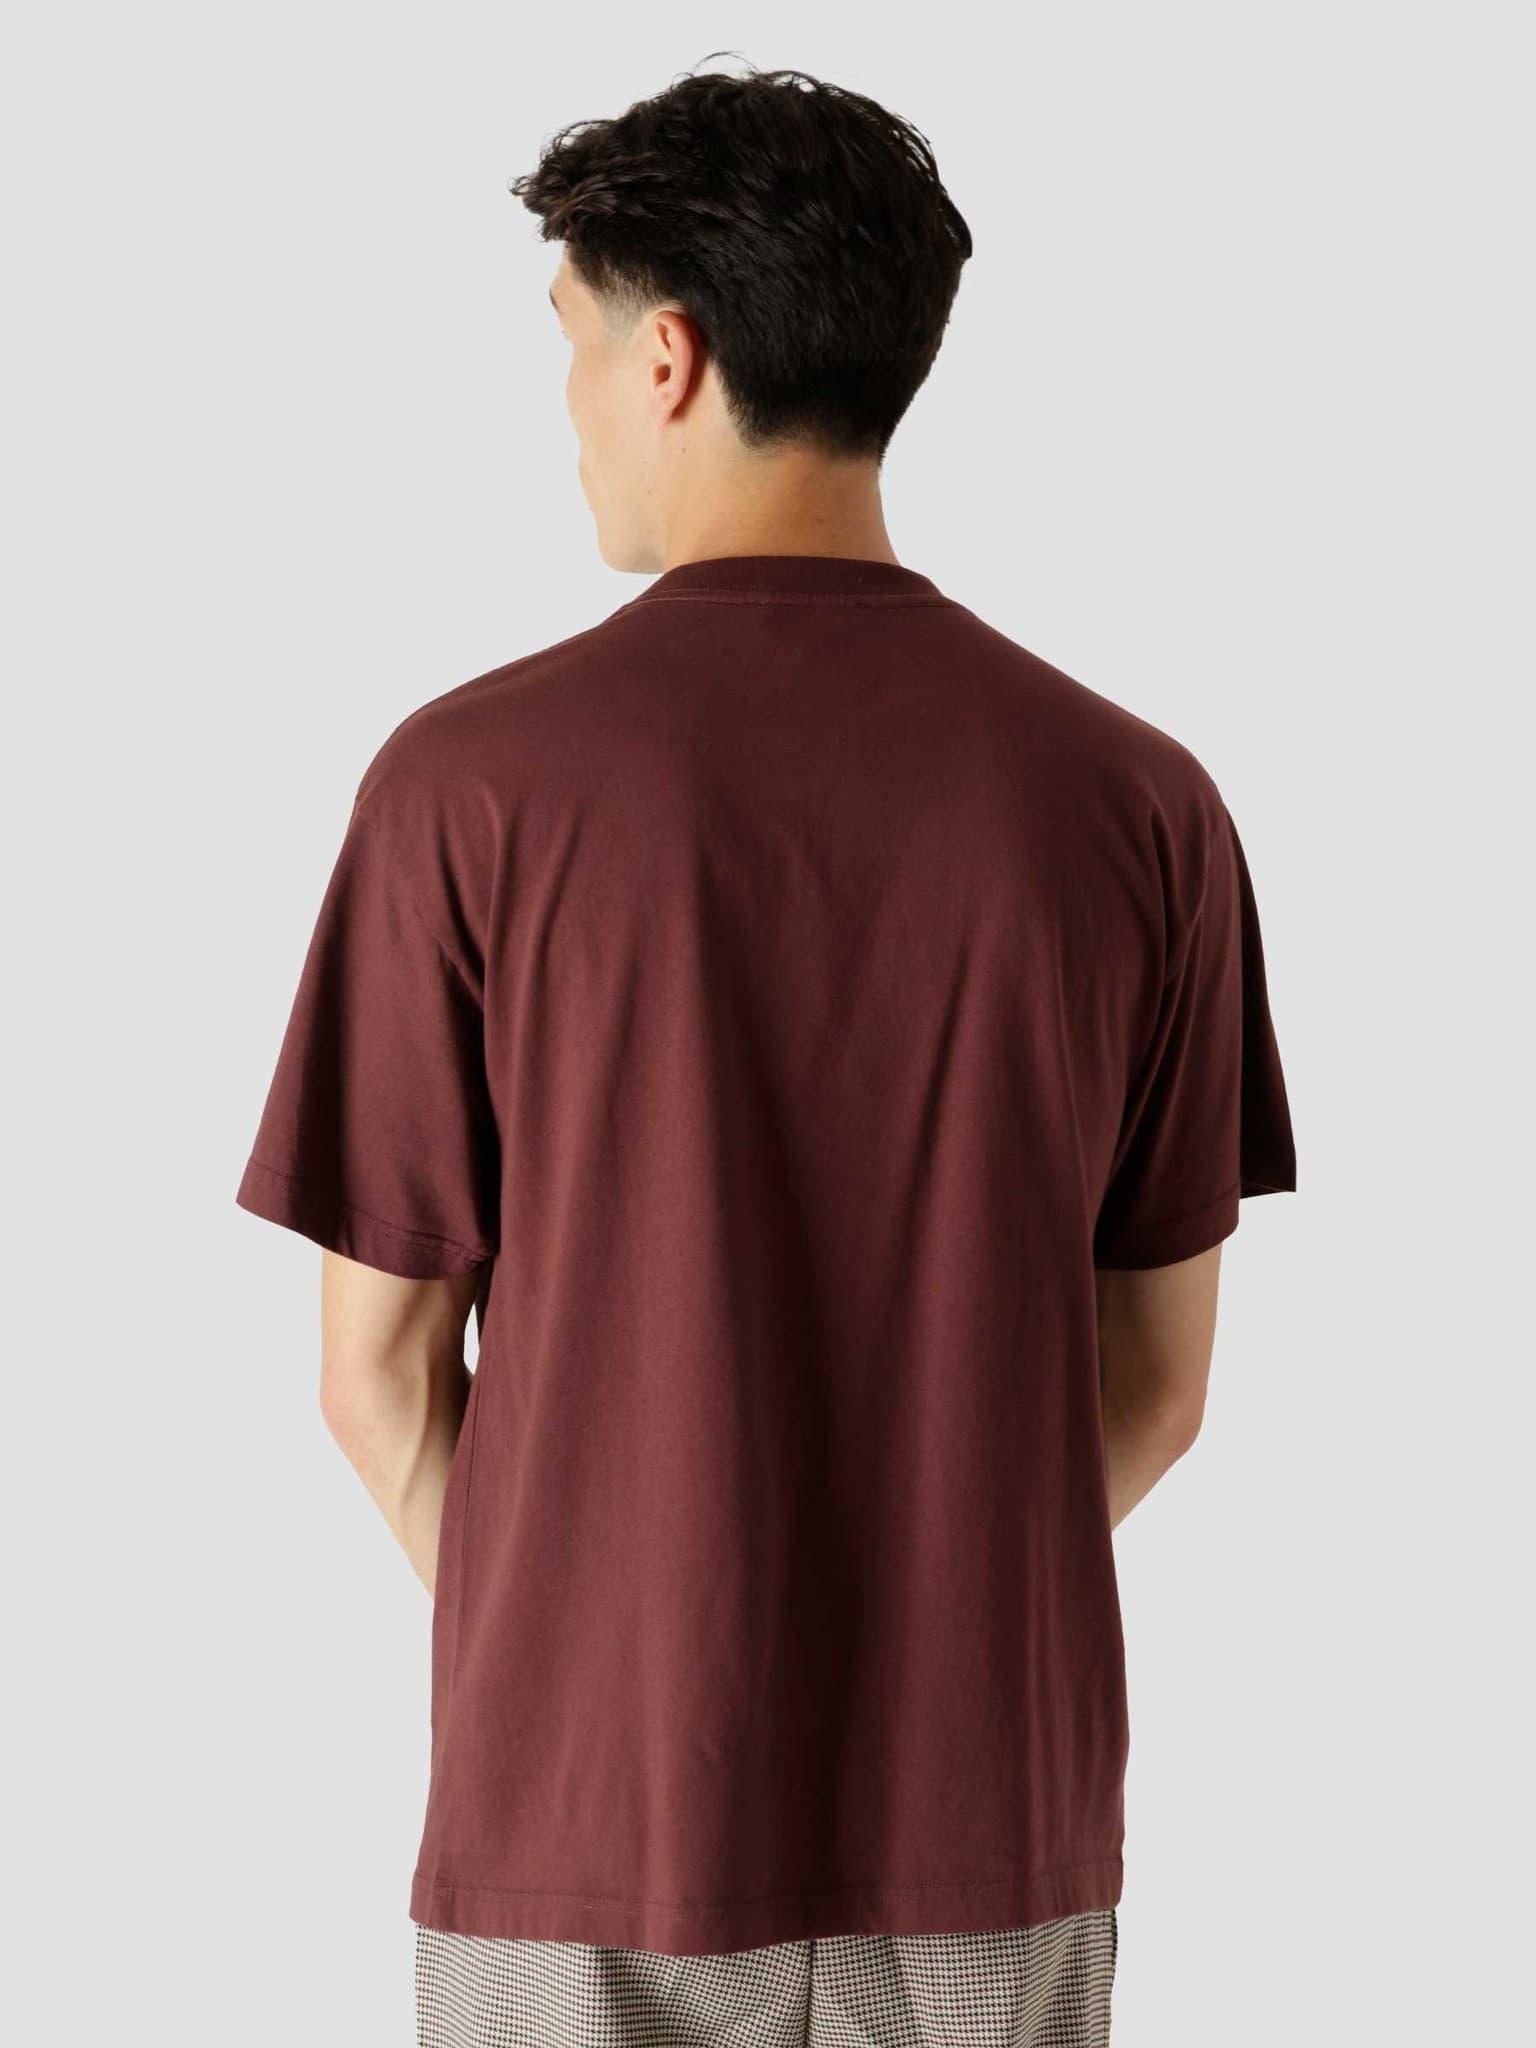 OLAF Uniform T-Shirt Burgundy